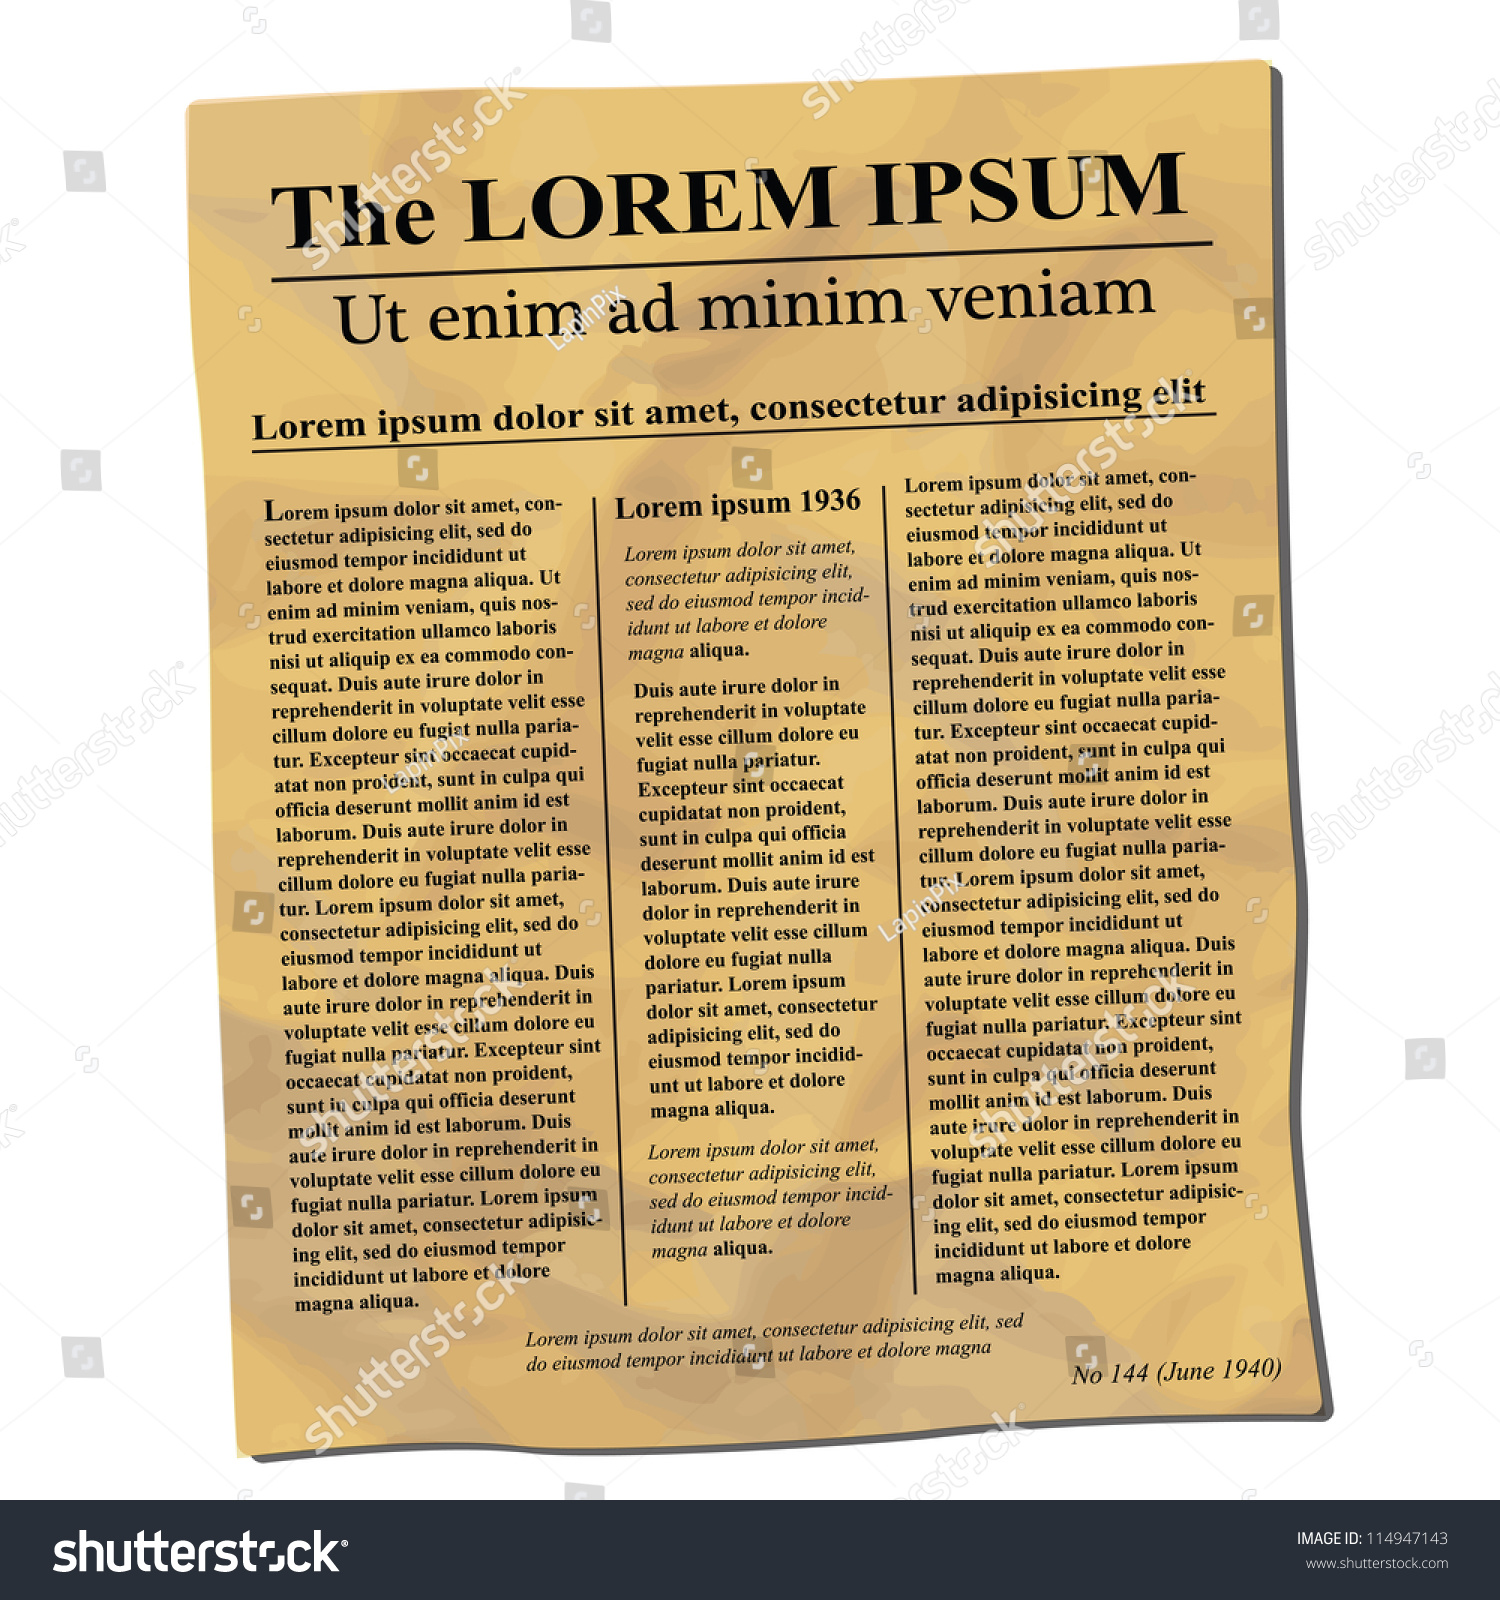 Old Crumpled Newspaper Template Stock Vector 114947143 - Shutterstock